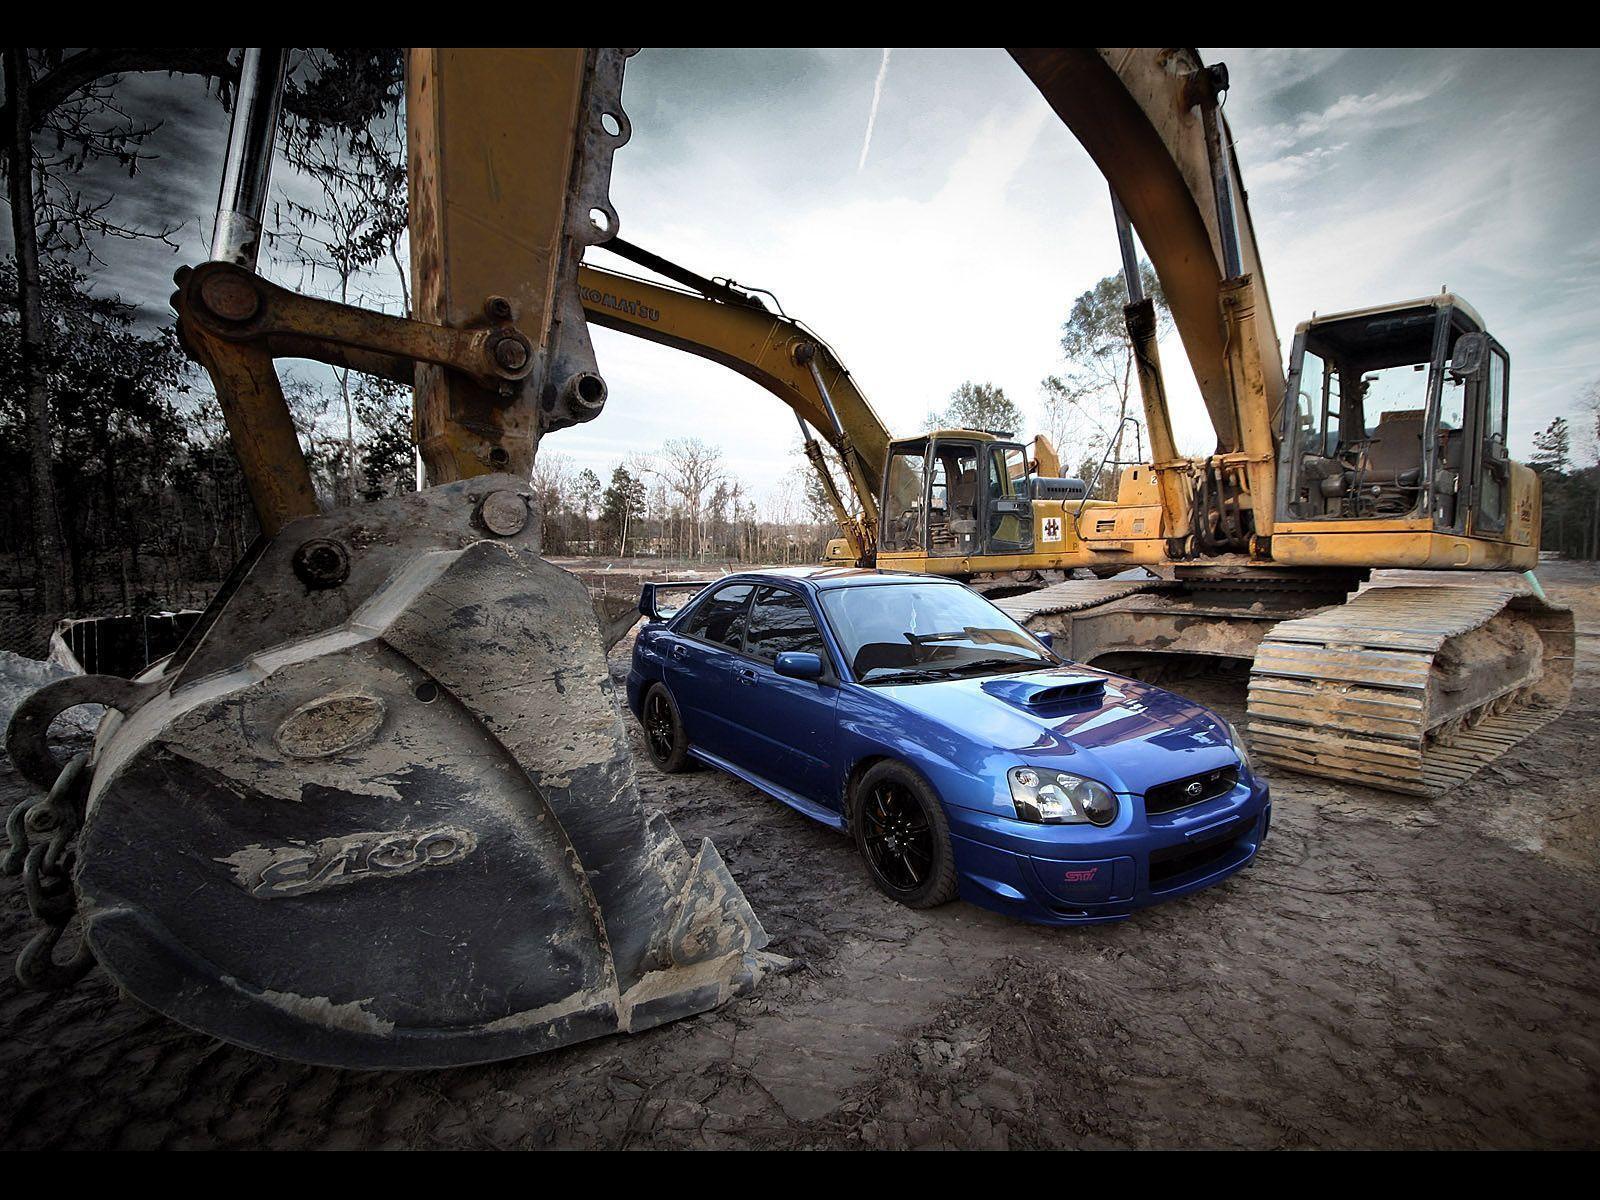 Wrx Sti 0 60 >> Subaru Impreza Wallpapers - Wallpaper Cave